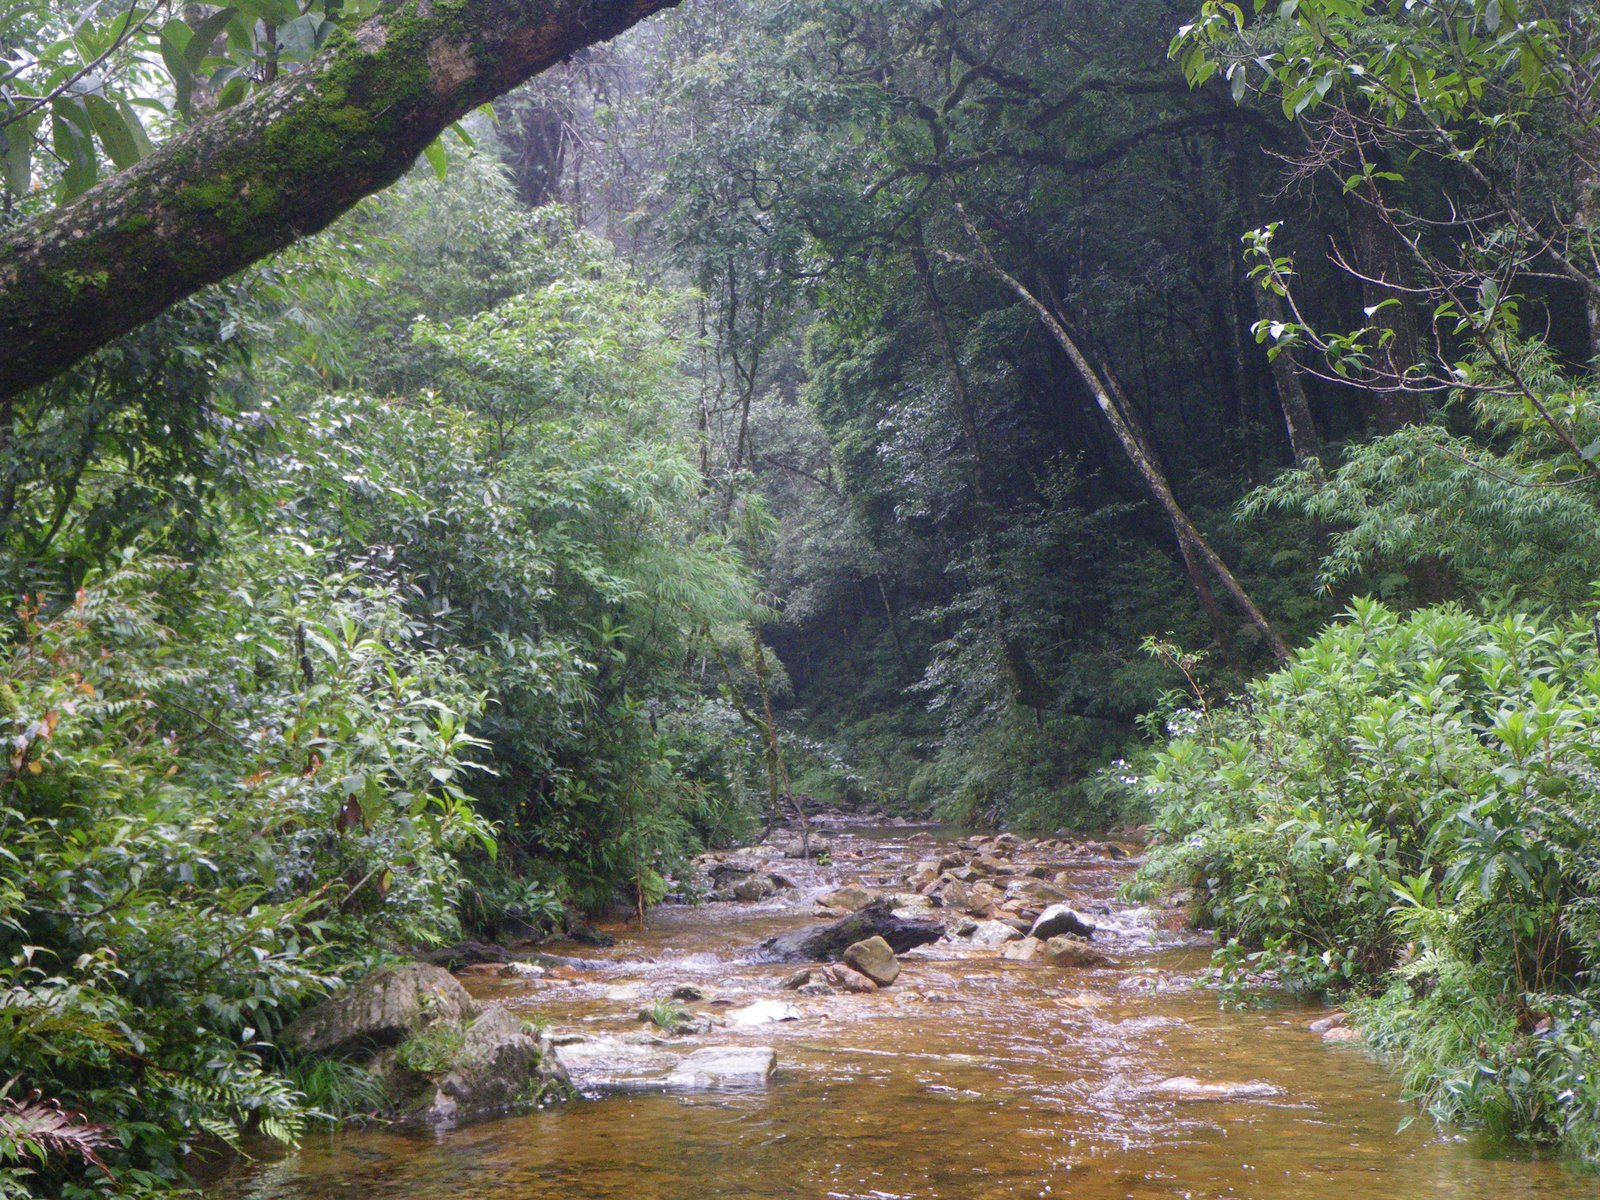 Stream in Hoang Lien National Park, northern Vietnam.